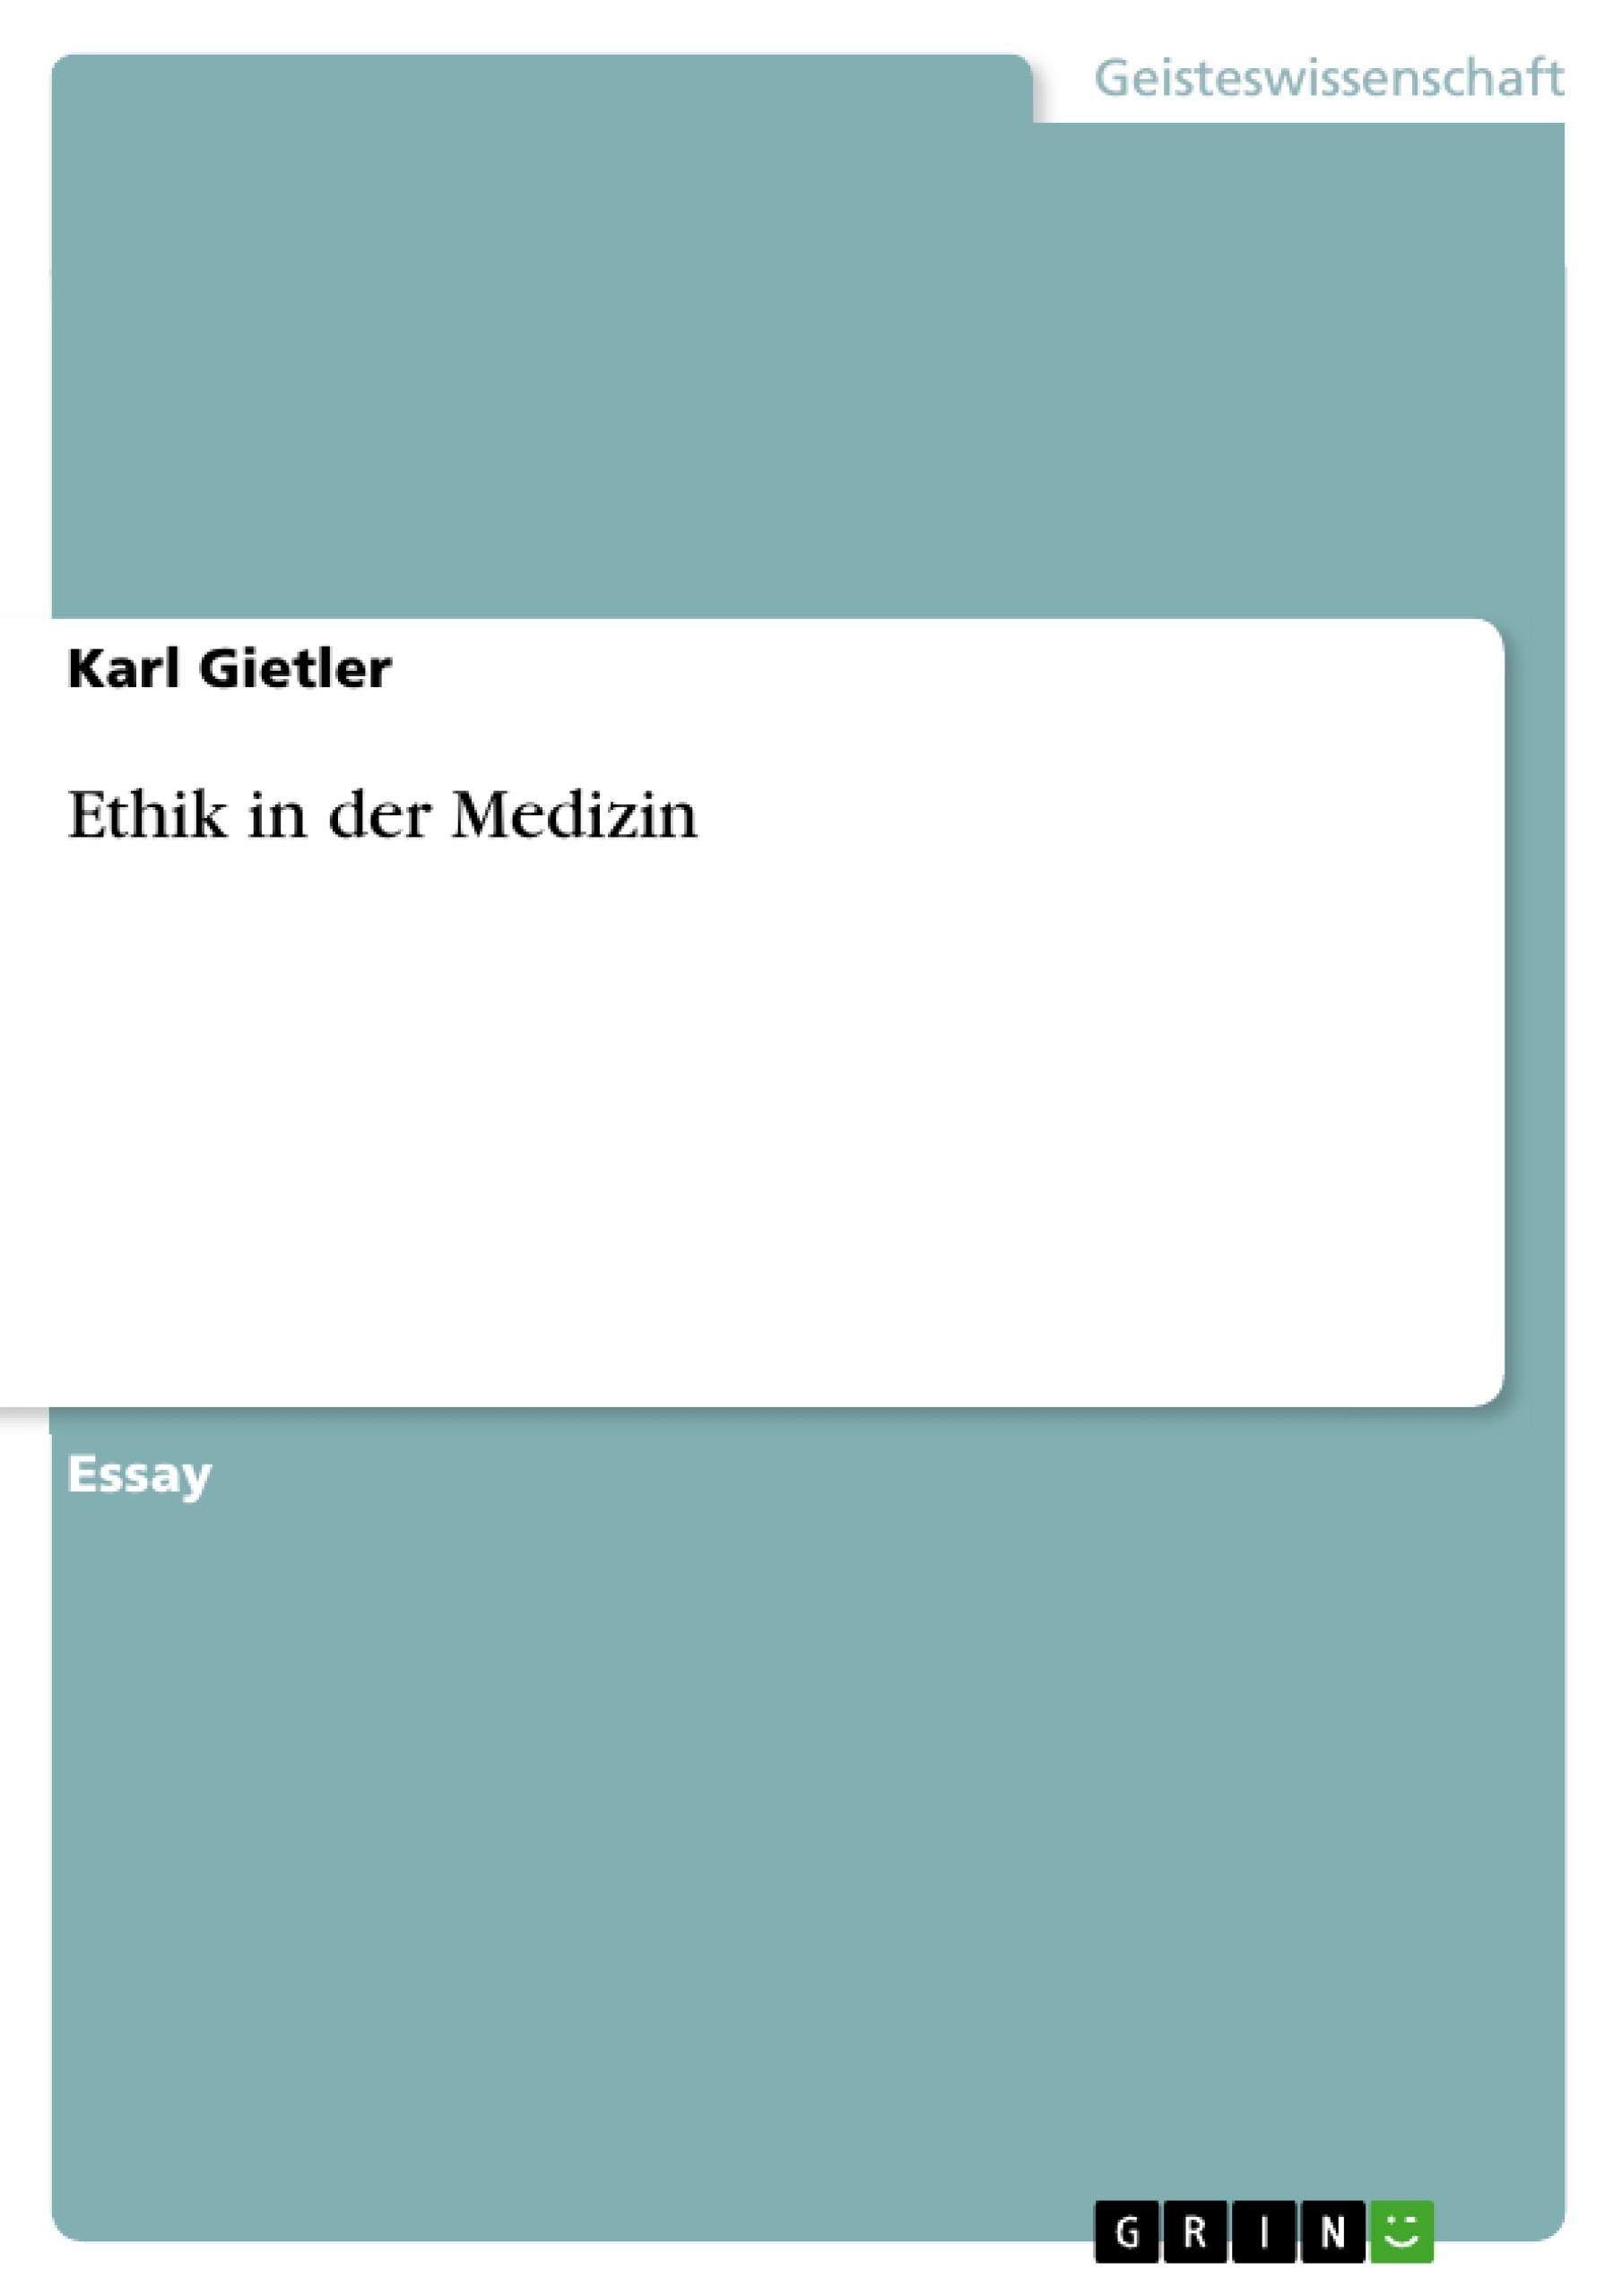 Titel: Ethik in der Medizin